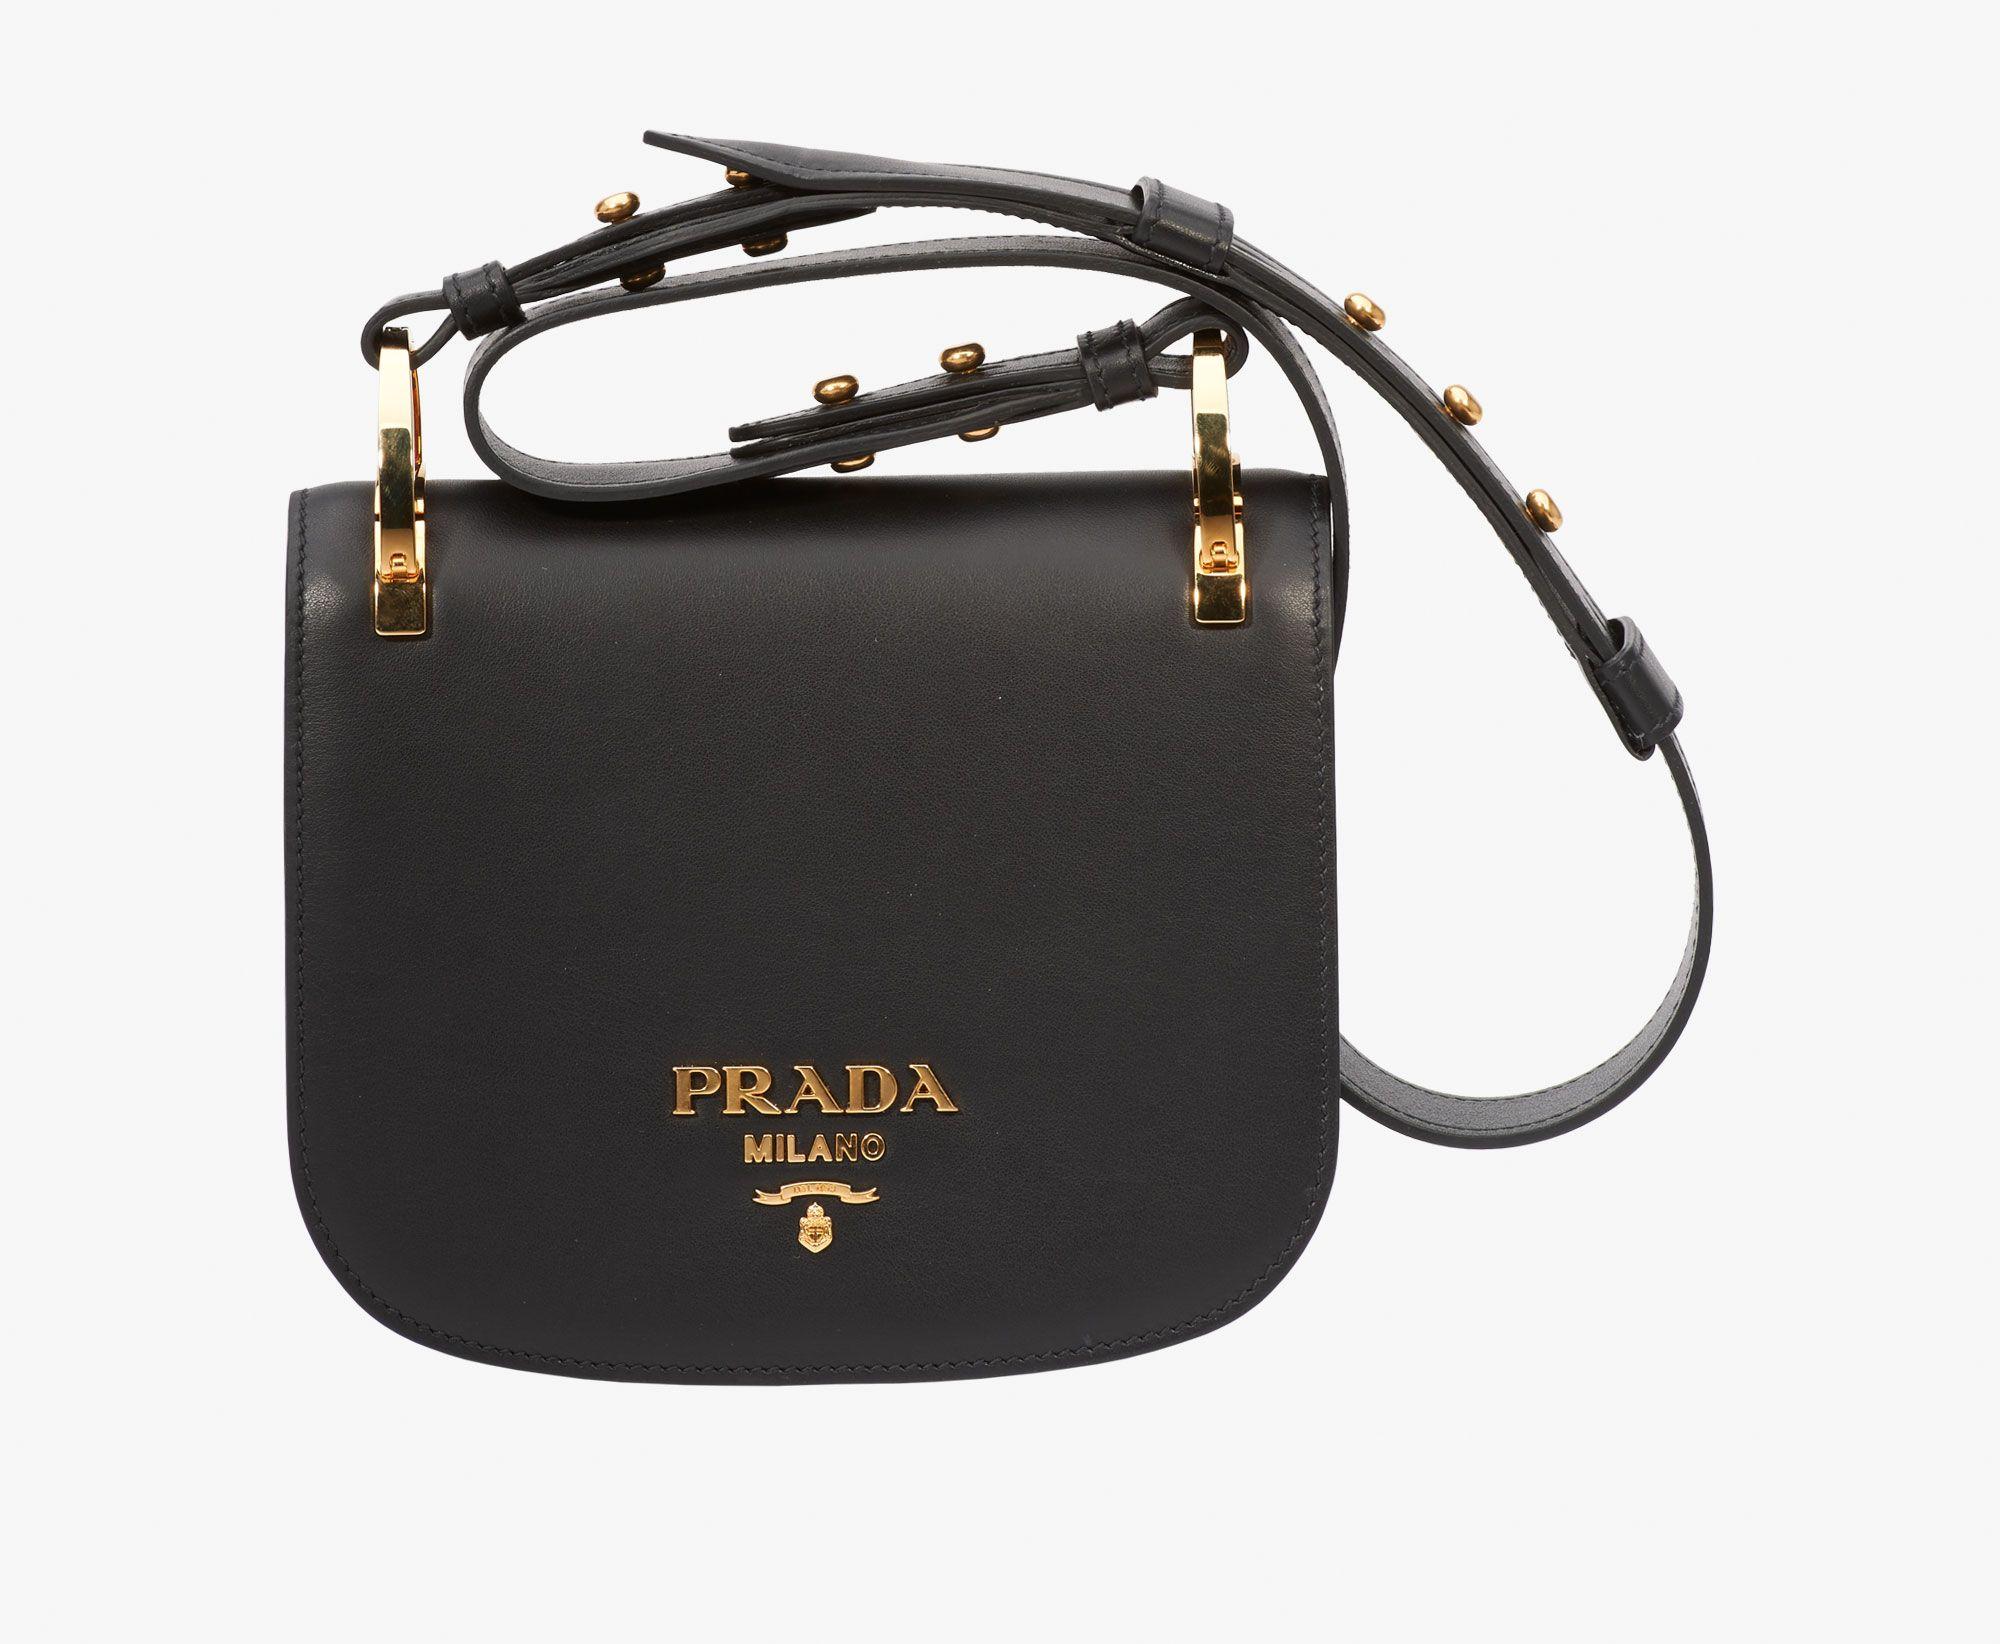 6de9cb37473b ... 50% off prada bn2832 tessuto nylon top handle convertible bag granato  prada woman prada pionnière